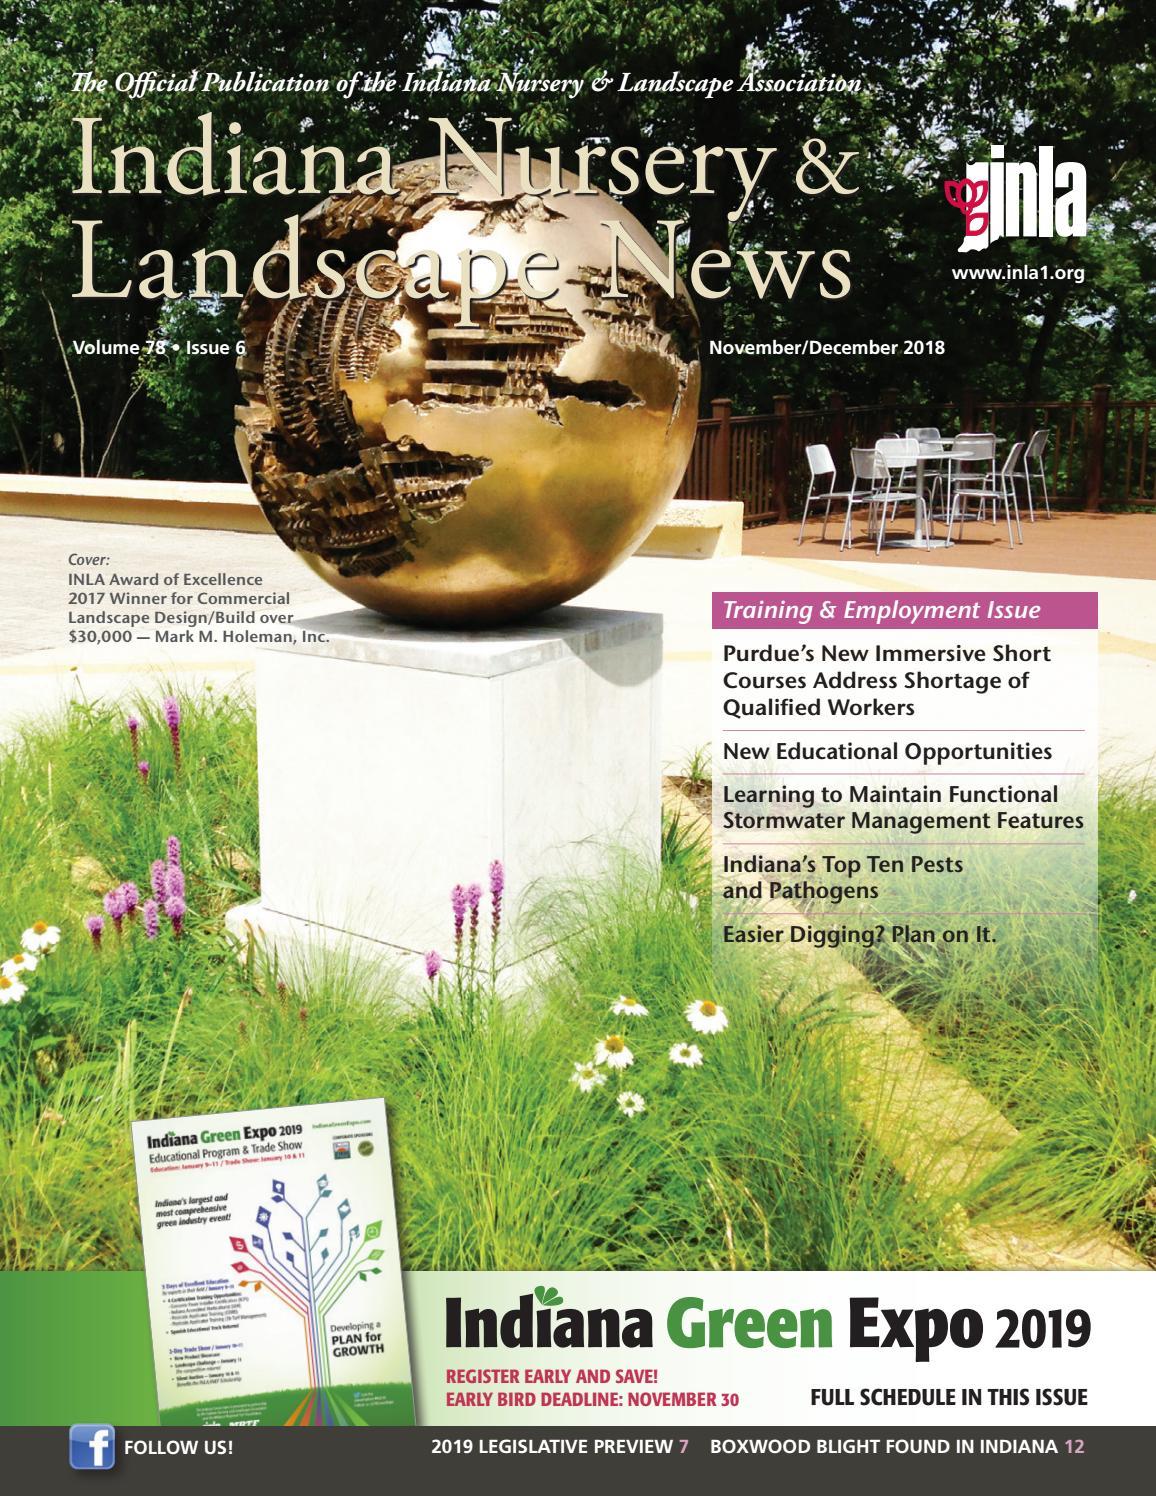 Indiana Nursery & Landscape News, November/December 2018 by